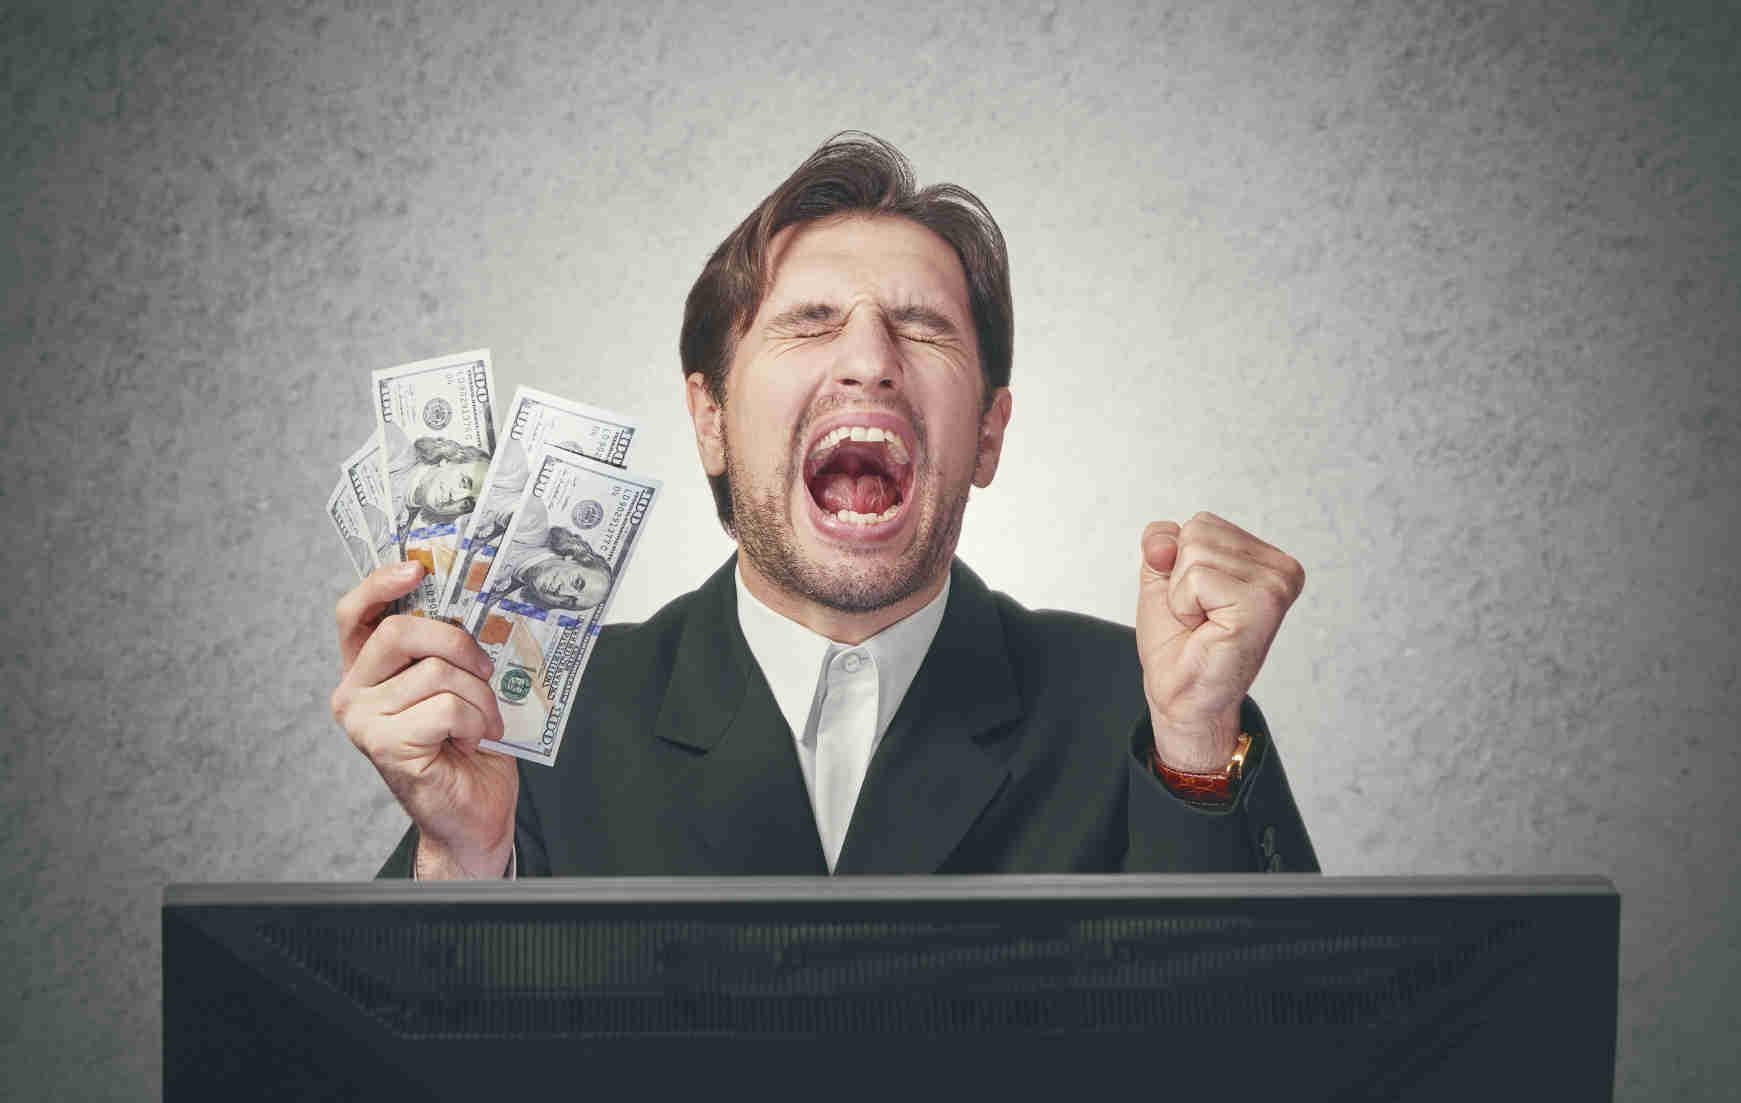 Engage employee with employee referral bonus